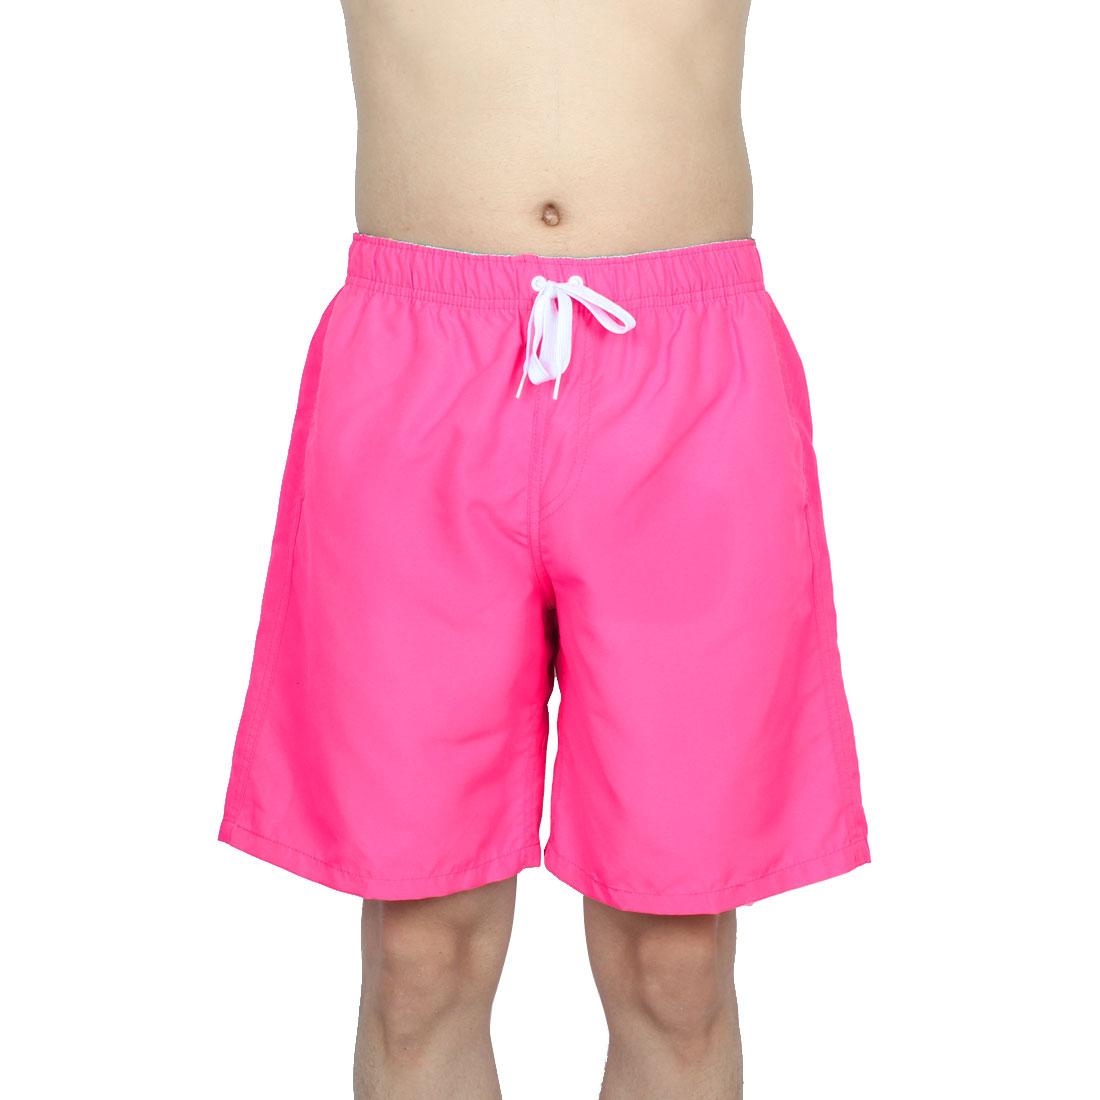 Adult swim shorts